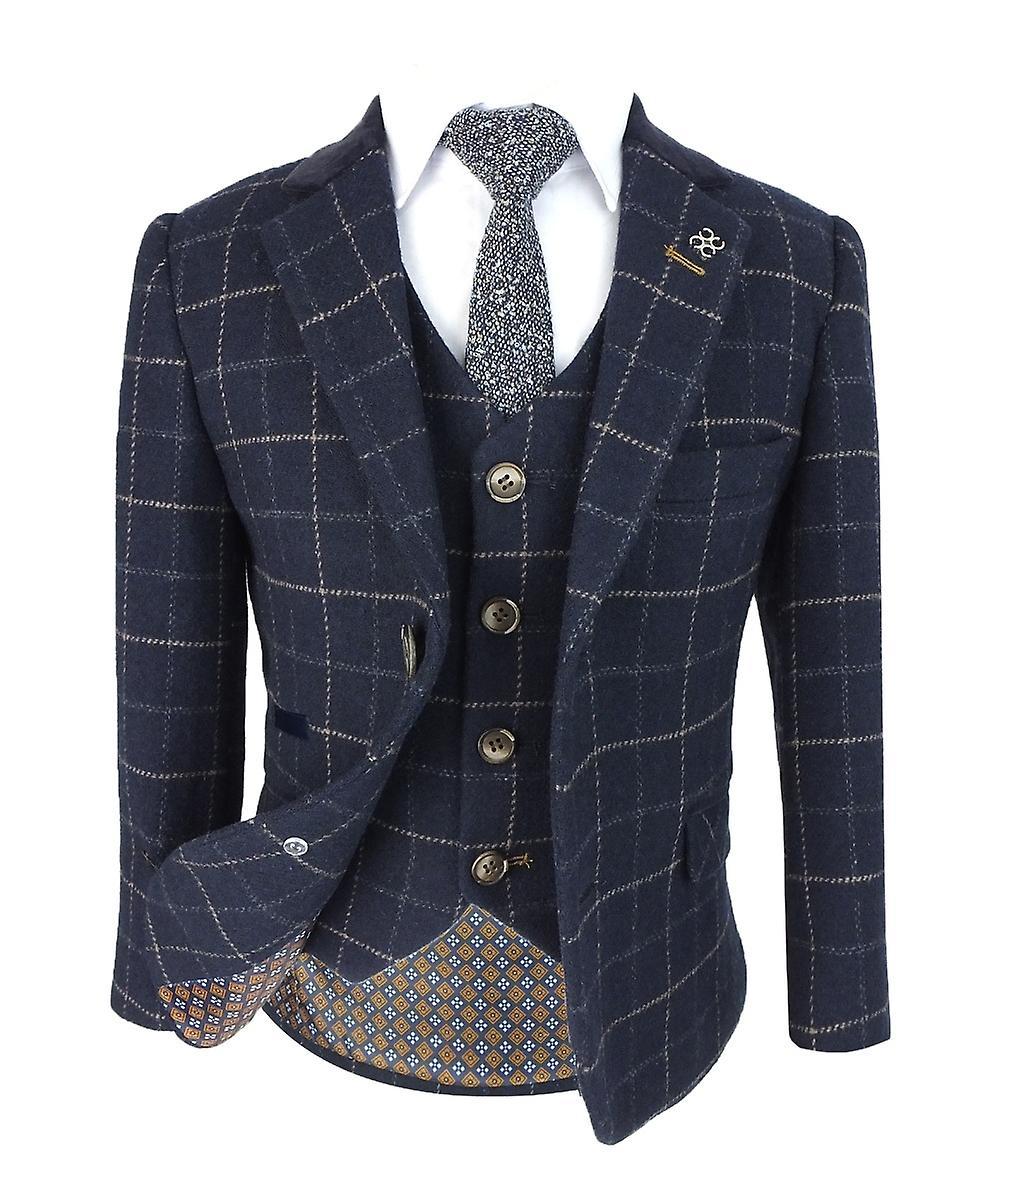 Costume de Tweed Cavani Shelby laine effet cocher bleu marine